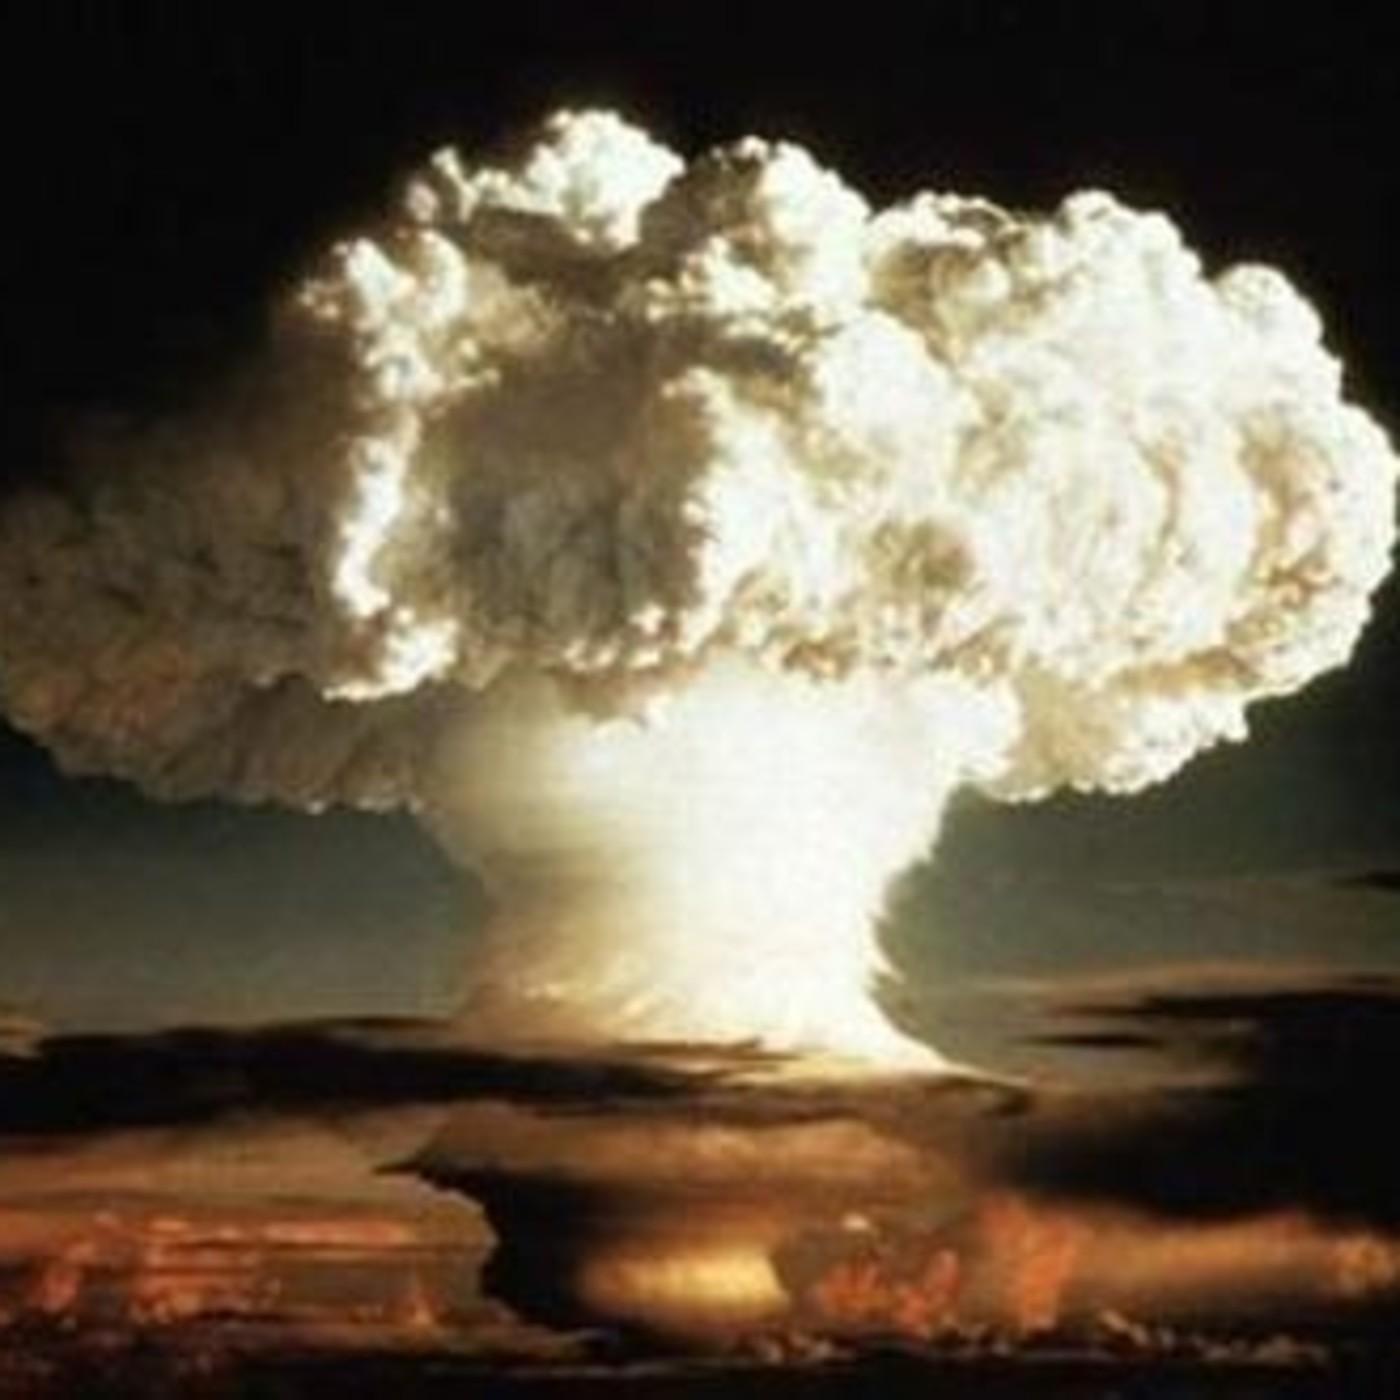 Voces del Misterio COPE: Historia secreta de la bomba atómica, con Javier Sierra